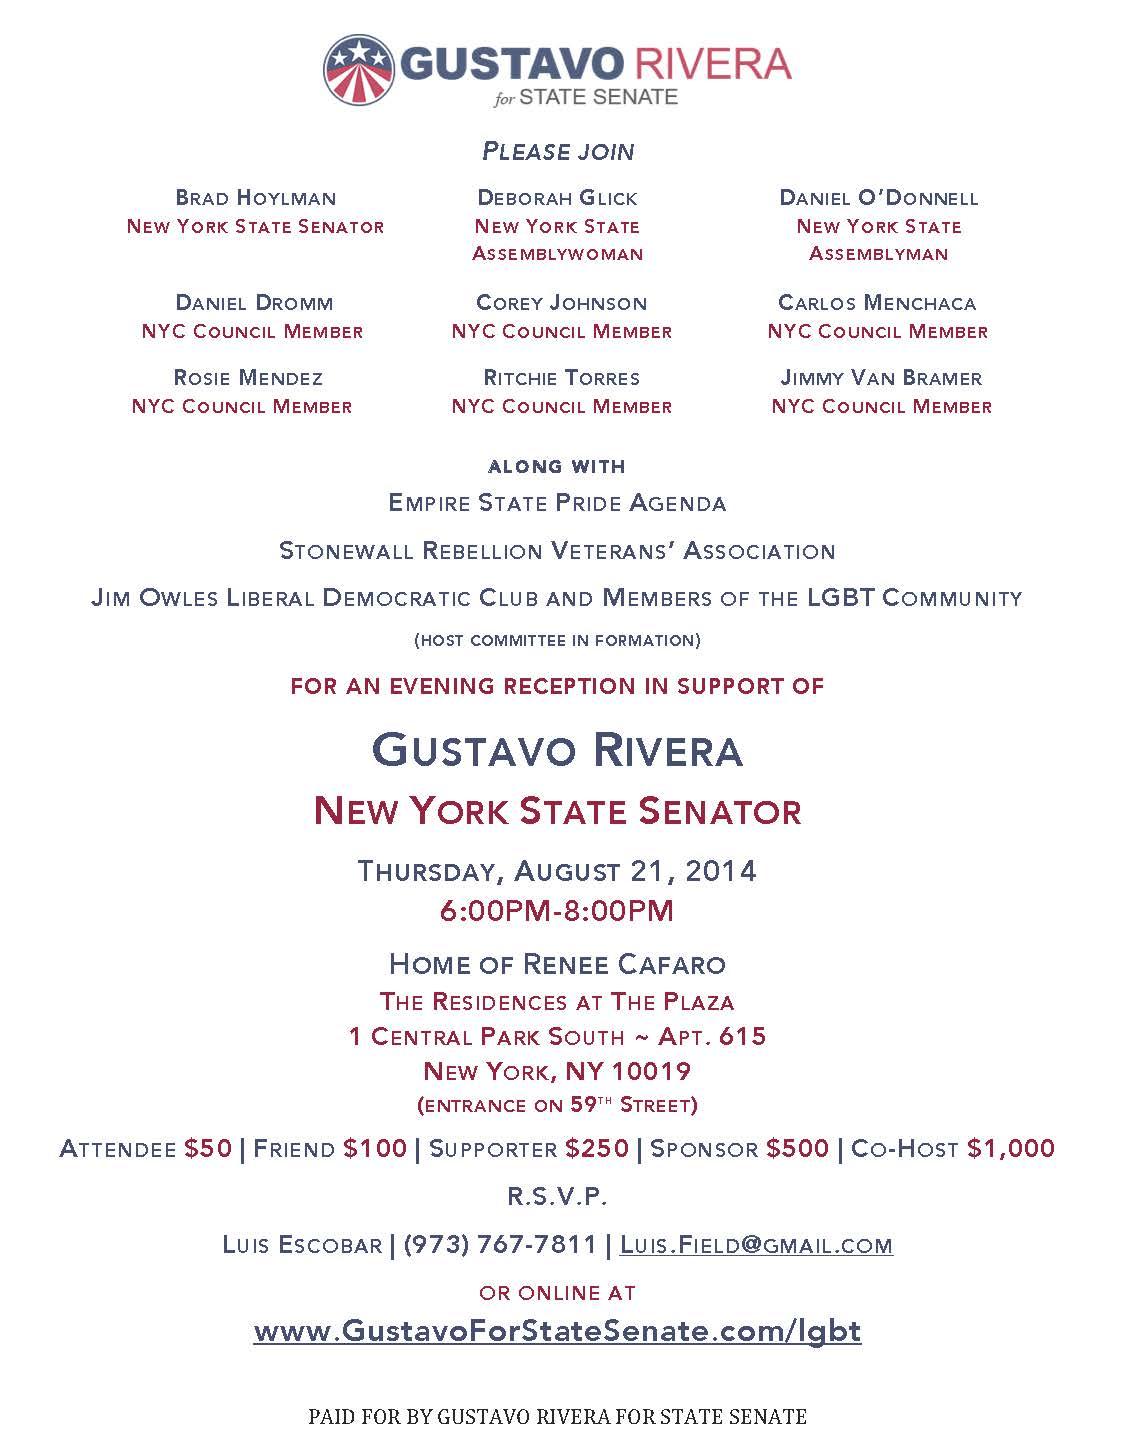 Gustavo.Rivera.LGBT.Aug21.Invite_Page_1.jpg